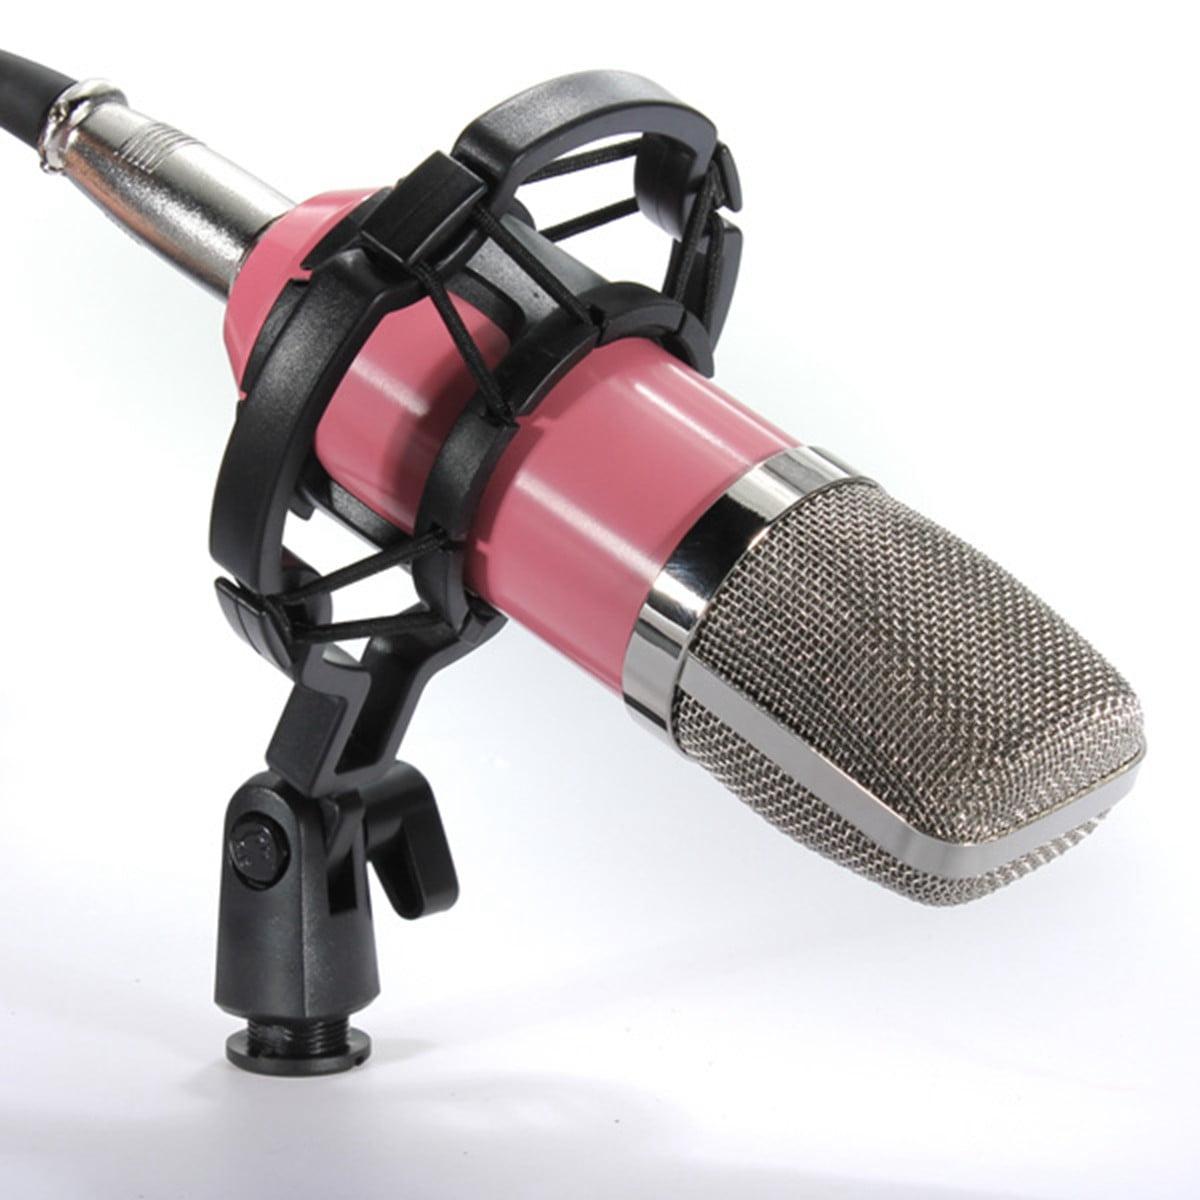 BM700 Dynamic Microphone Mic Sound Studio Record Recording Kit with Shock Mount,Black... by